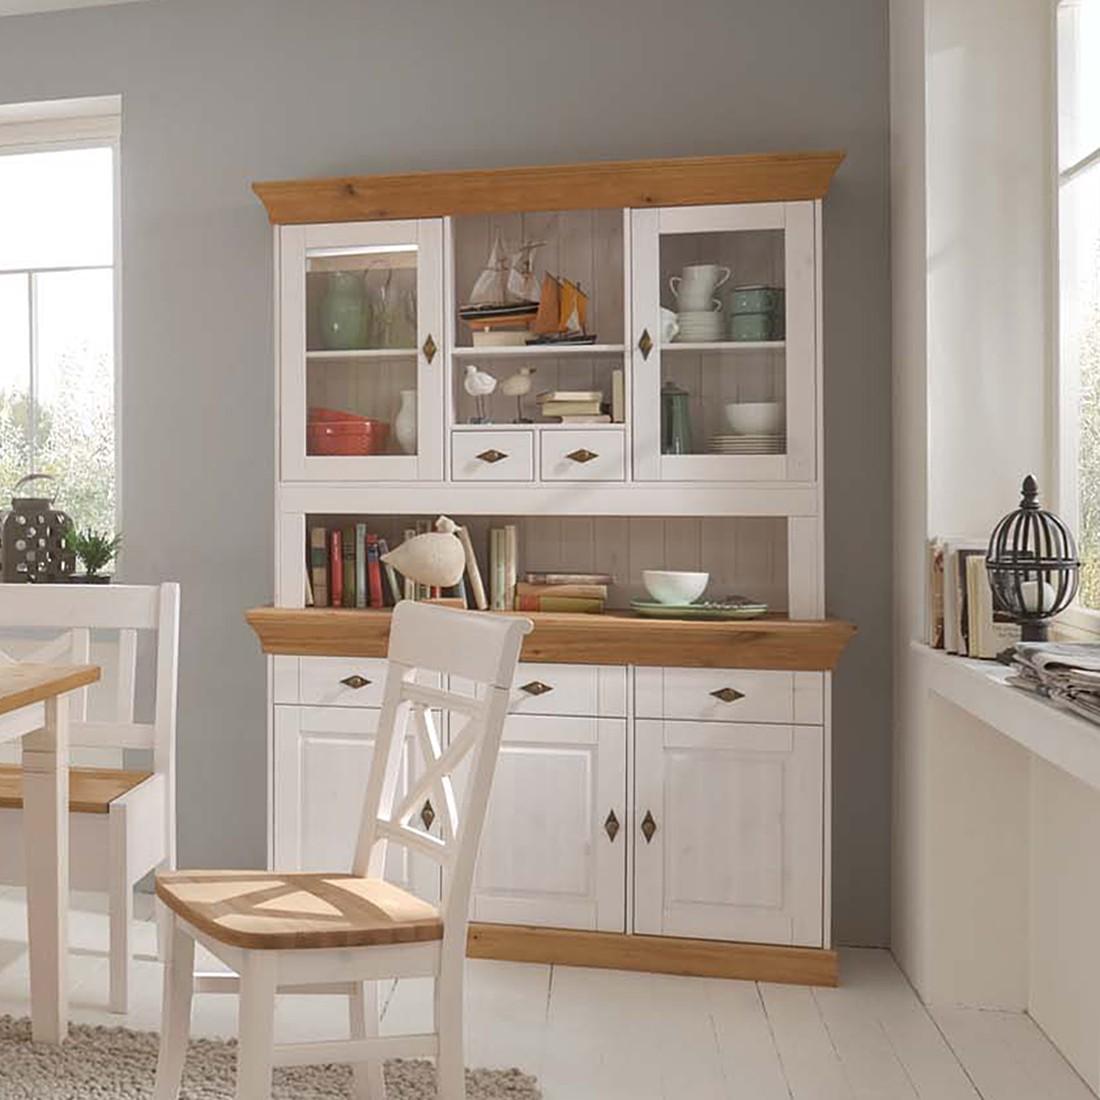 gelb schwarzes schlafzimmer. Black Bedroom Furniture Sets. Home Design Ideas